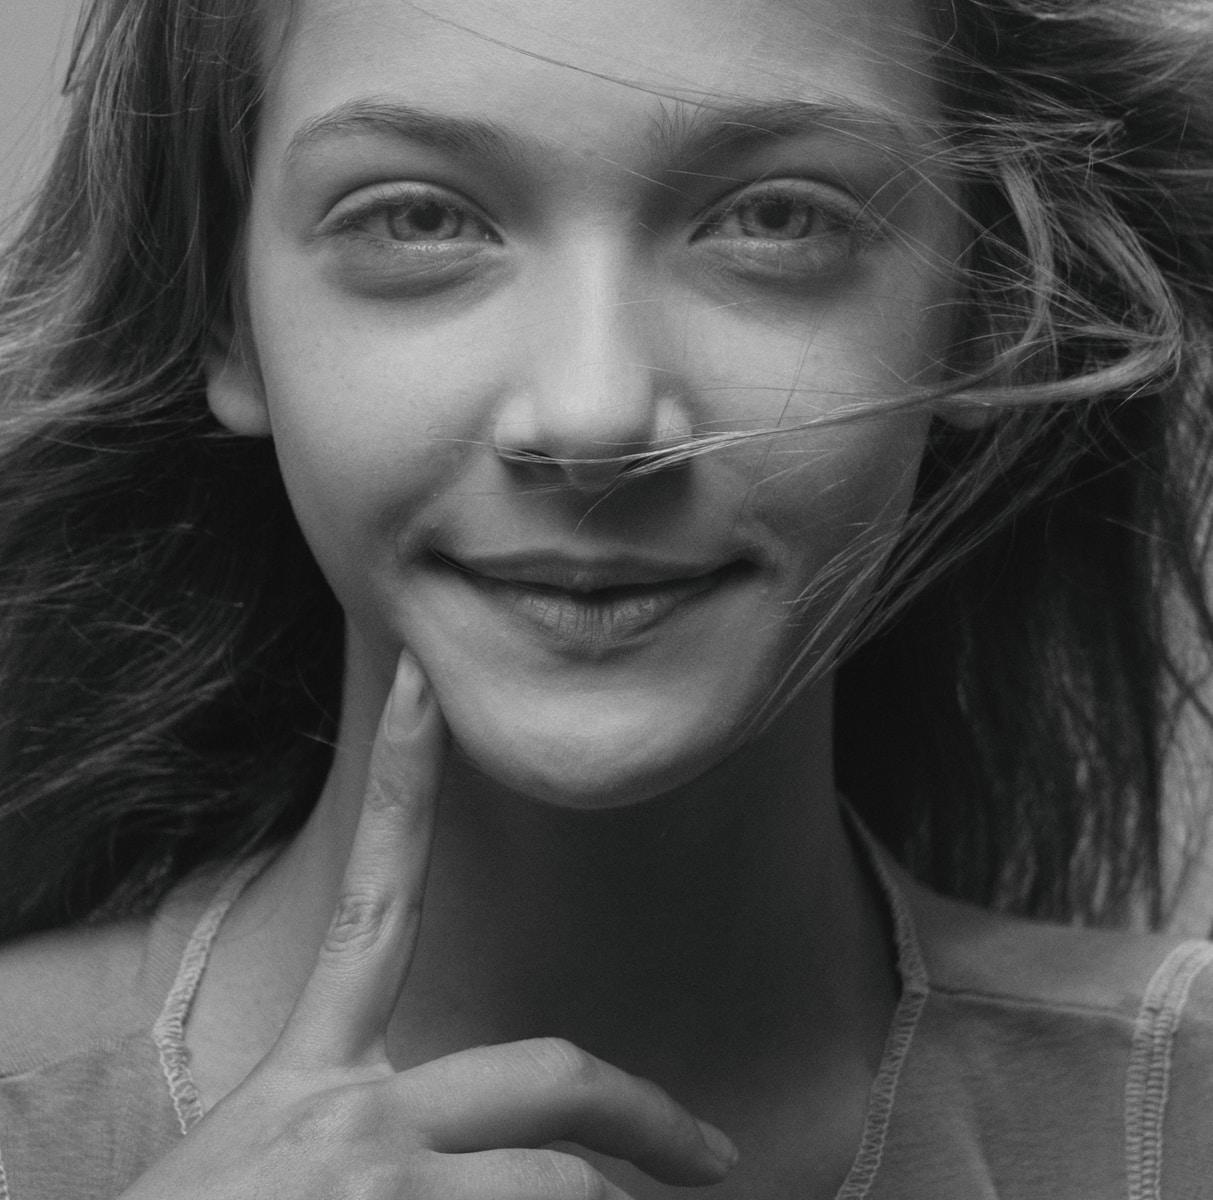 woman in tank top smiling